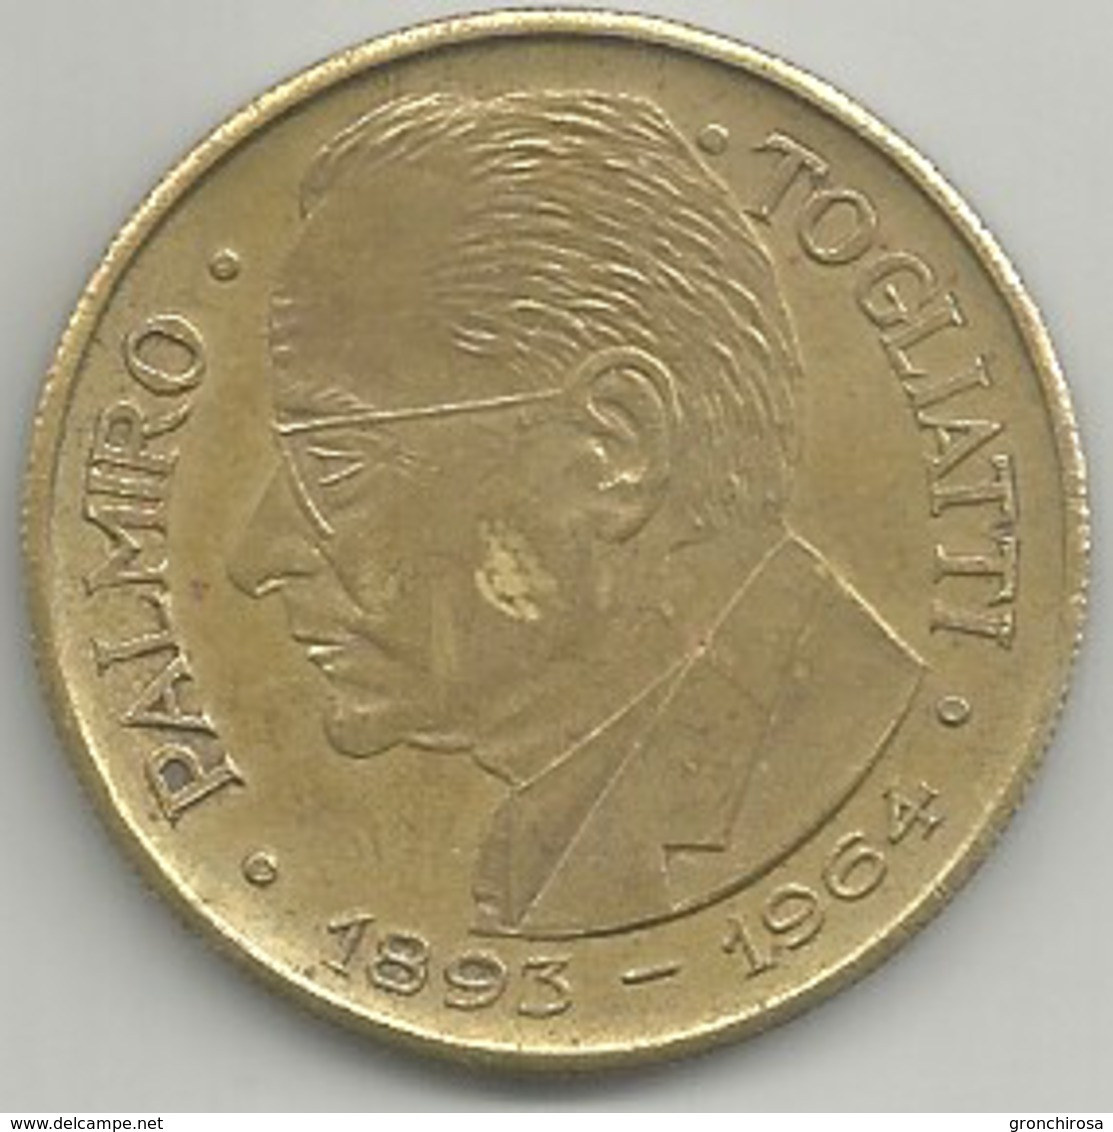 Togliatti Palmiro 1893 - 1964, P.C.I., Ae. Gr. 15 Cm. 3,5. - Altri